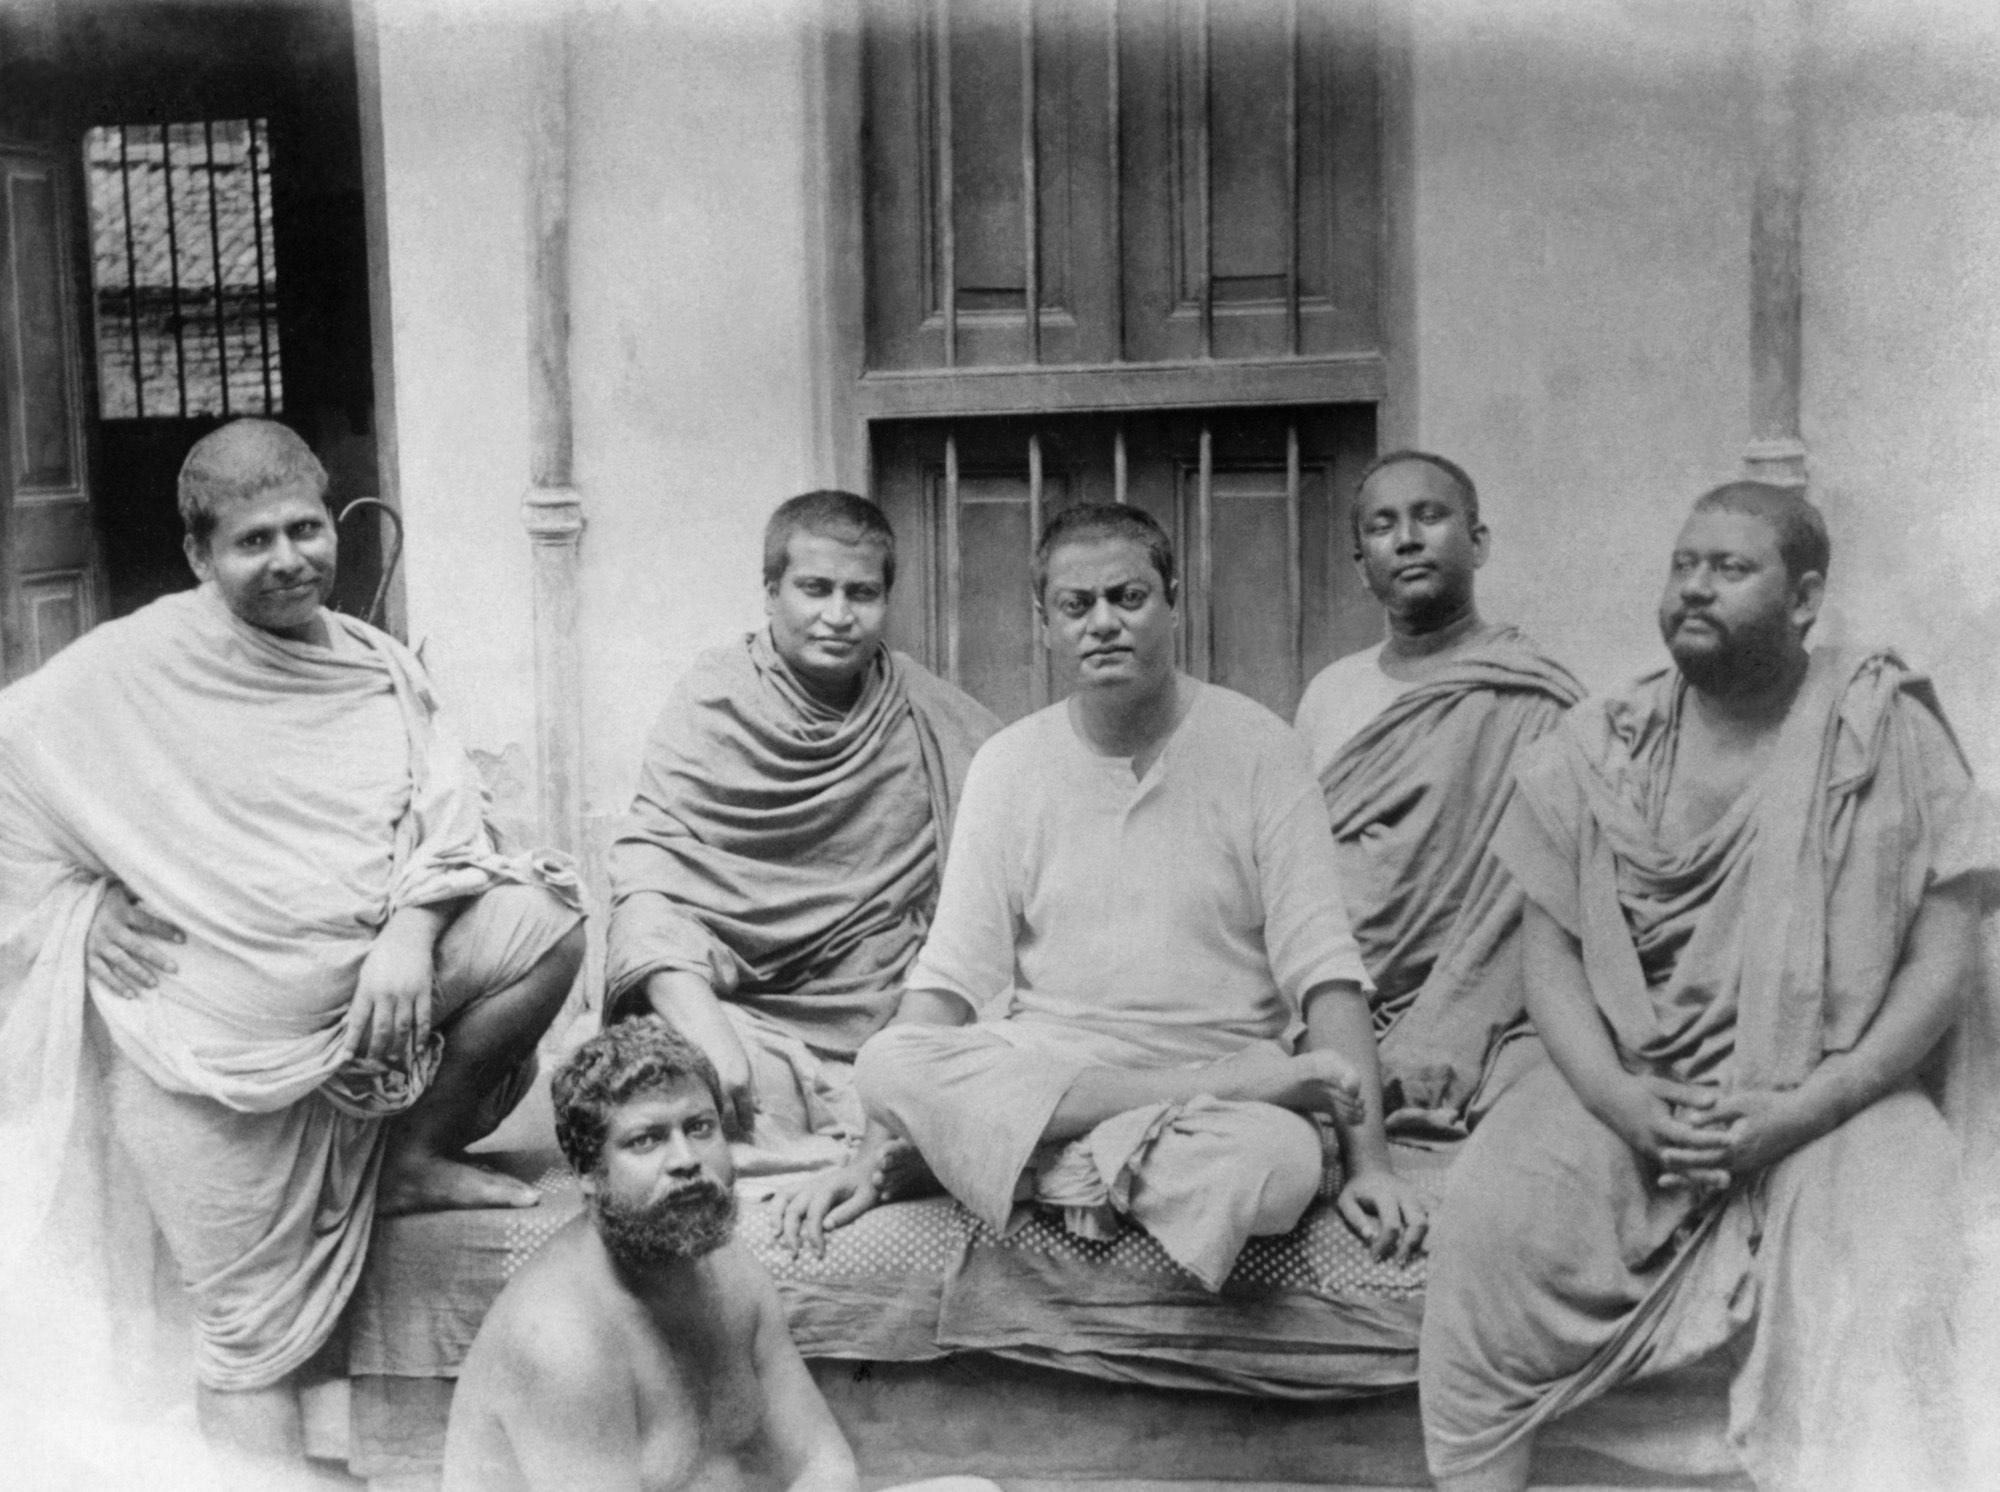 (#75) Kolkata, (June 20?), 1899. This picture was taken at a rented house (8 Bosepara Lane, where Holy Mother was staying at the time.  ( From  L): Swami Trigunatita, Swami Shivananda, Swamiji, Swami Turiyananda, Swami Brahmananda, and ( seated below ) Swami Sadananda.